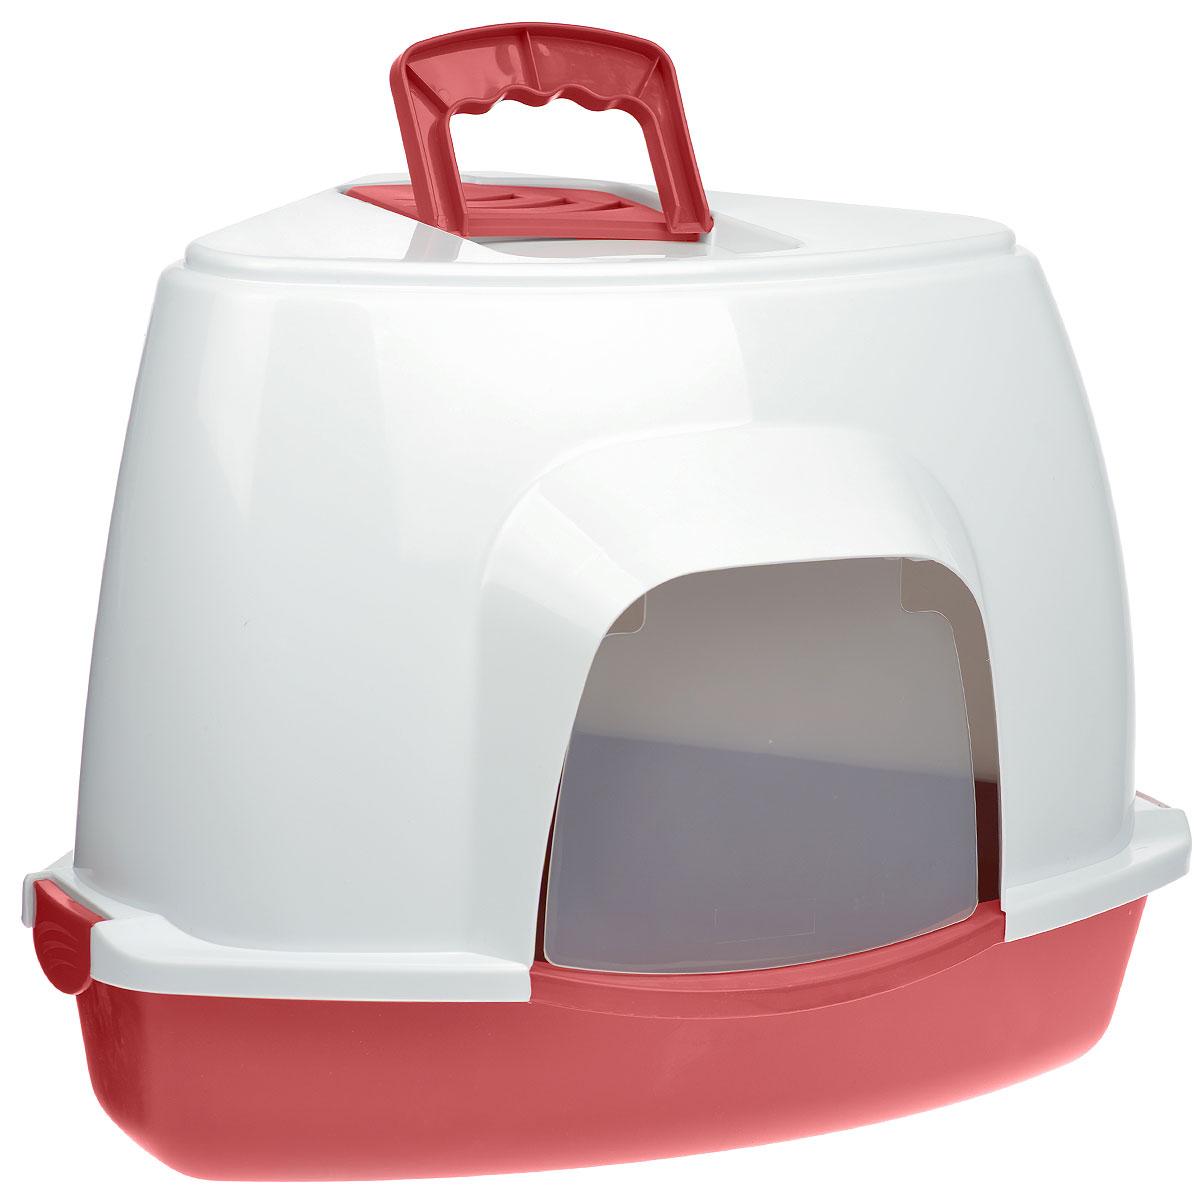 "Туалет для кошек Fauna ""Kitty Luxer"", цвет: красный, белый, 38 см х 38 см х 56 см"